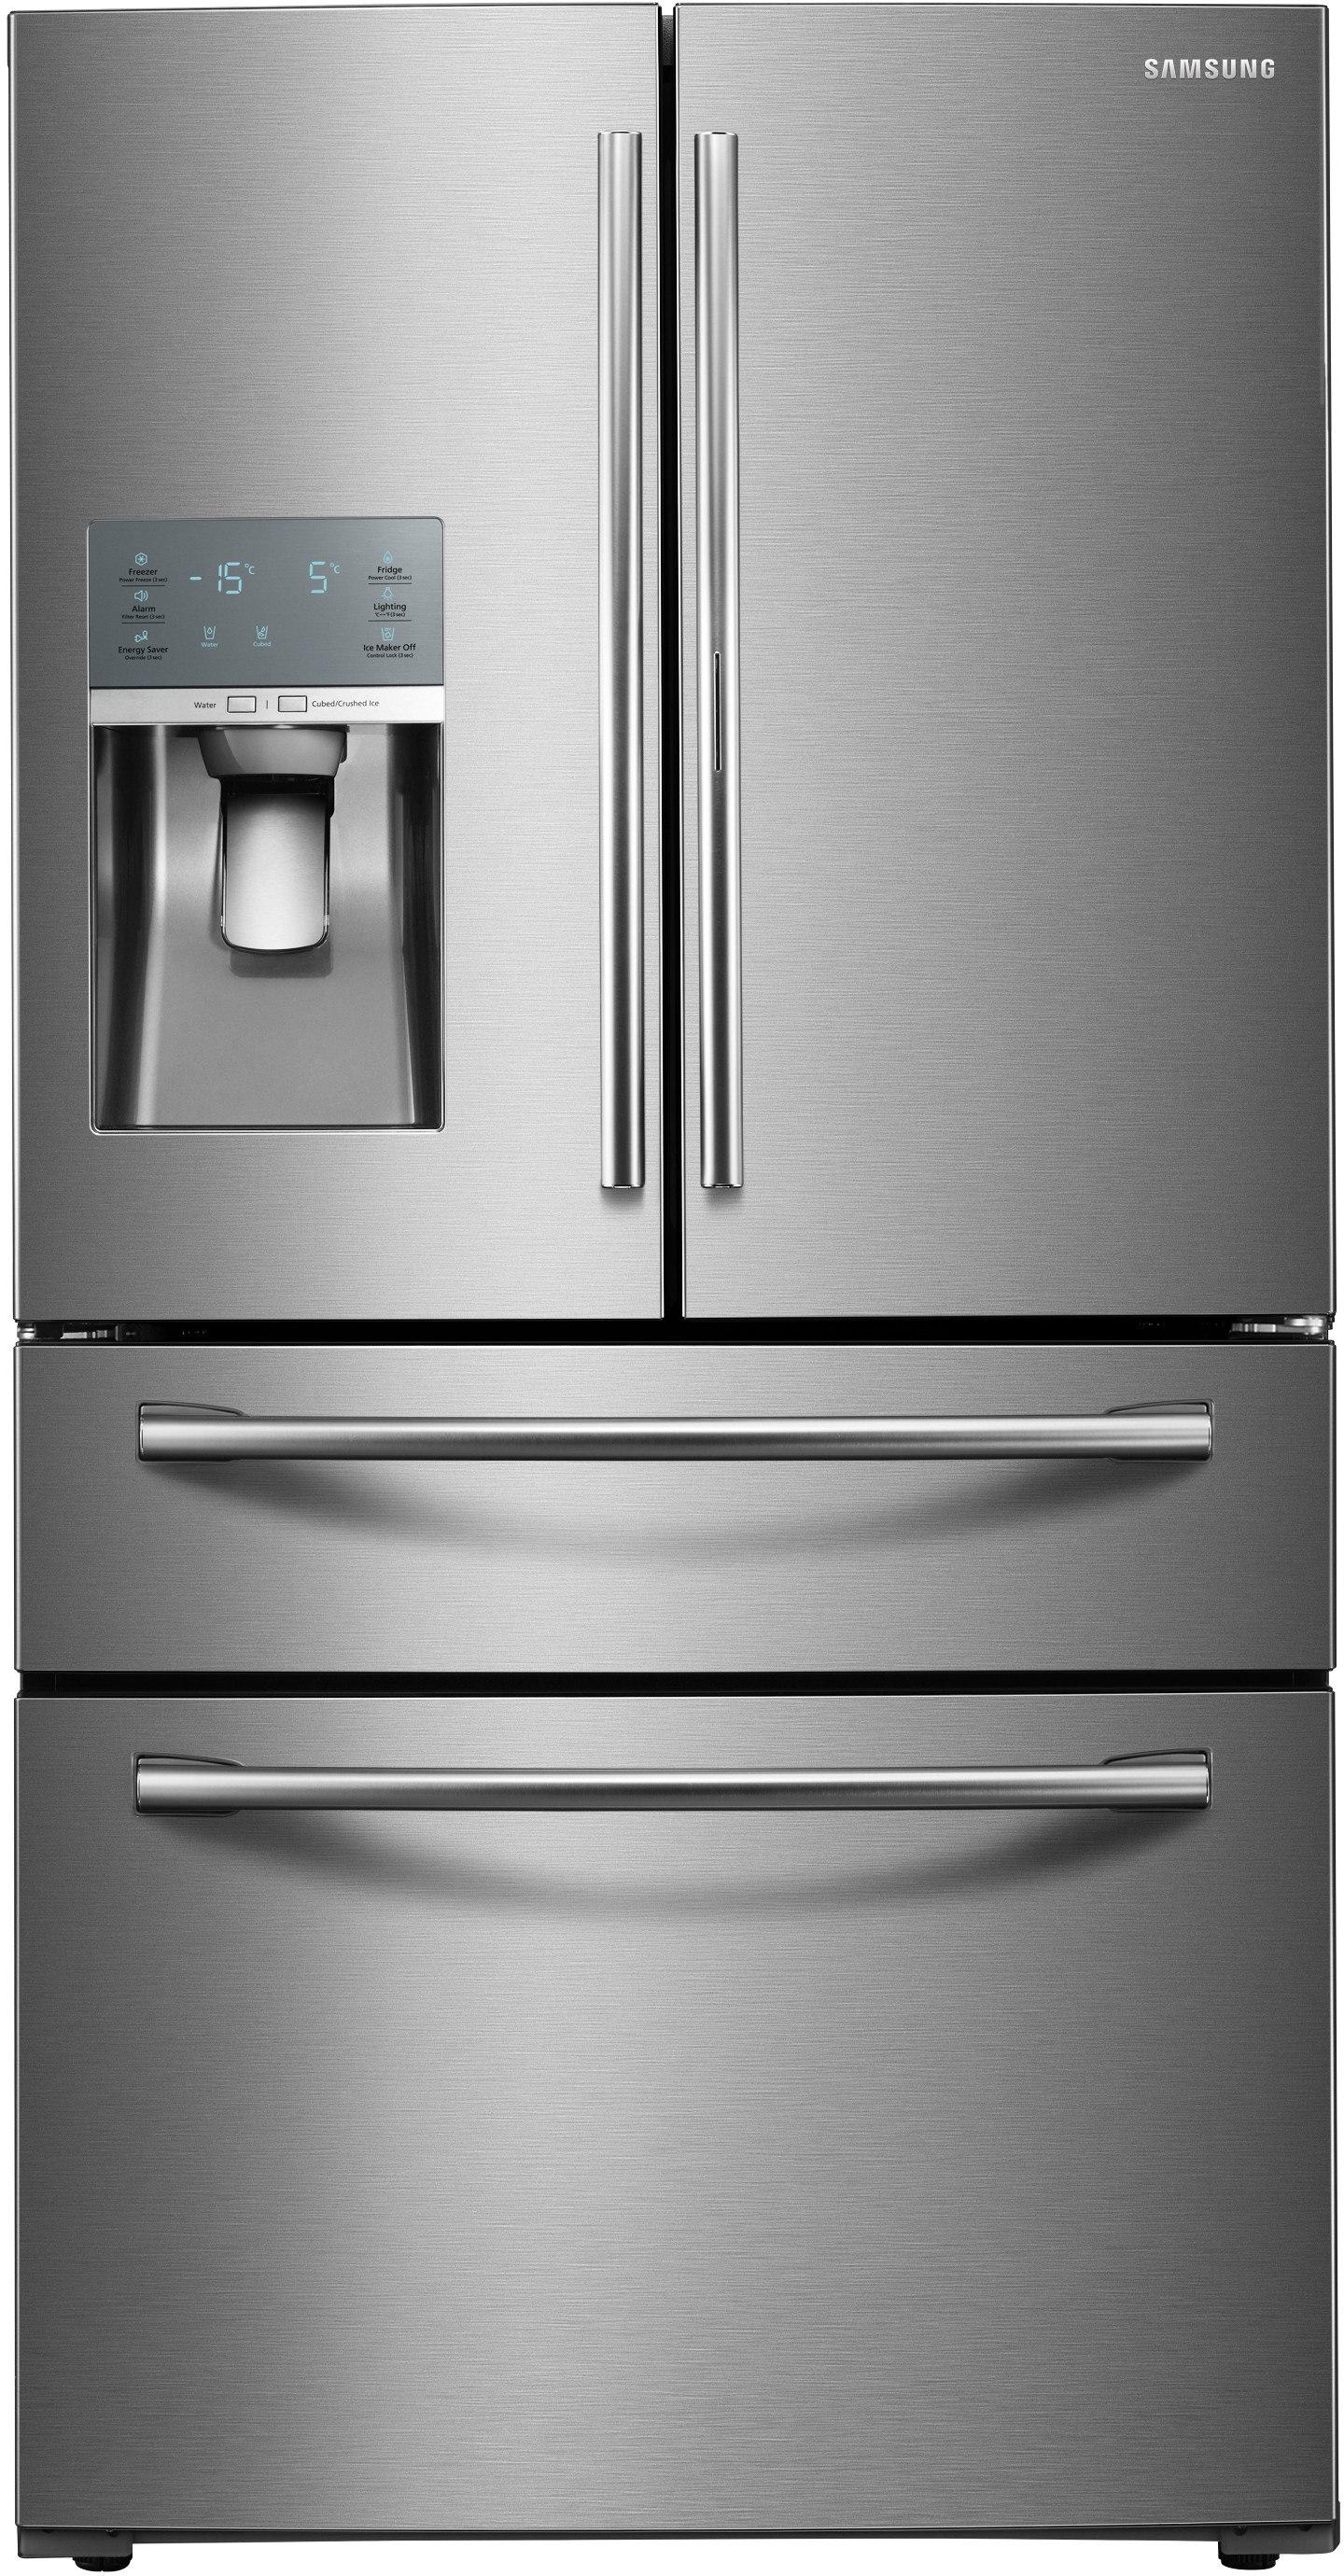 all blogs greenbuildingadvisor bosch com dishwashers dishwasher image about drawer musings dept single